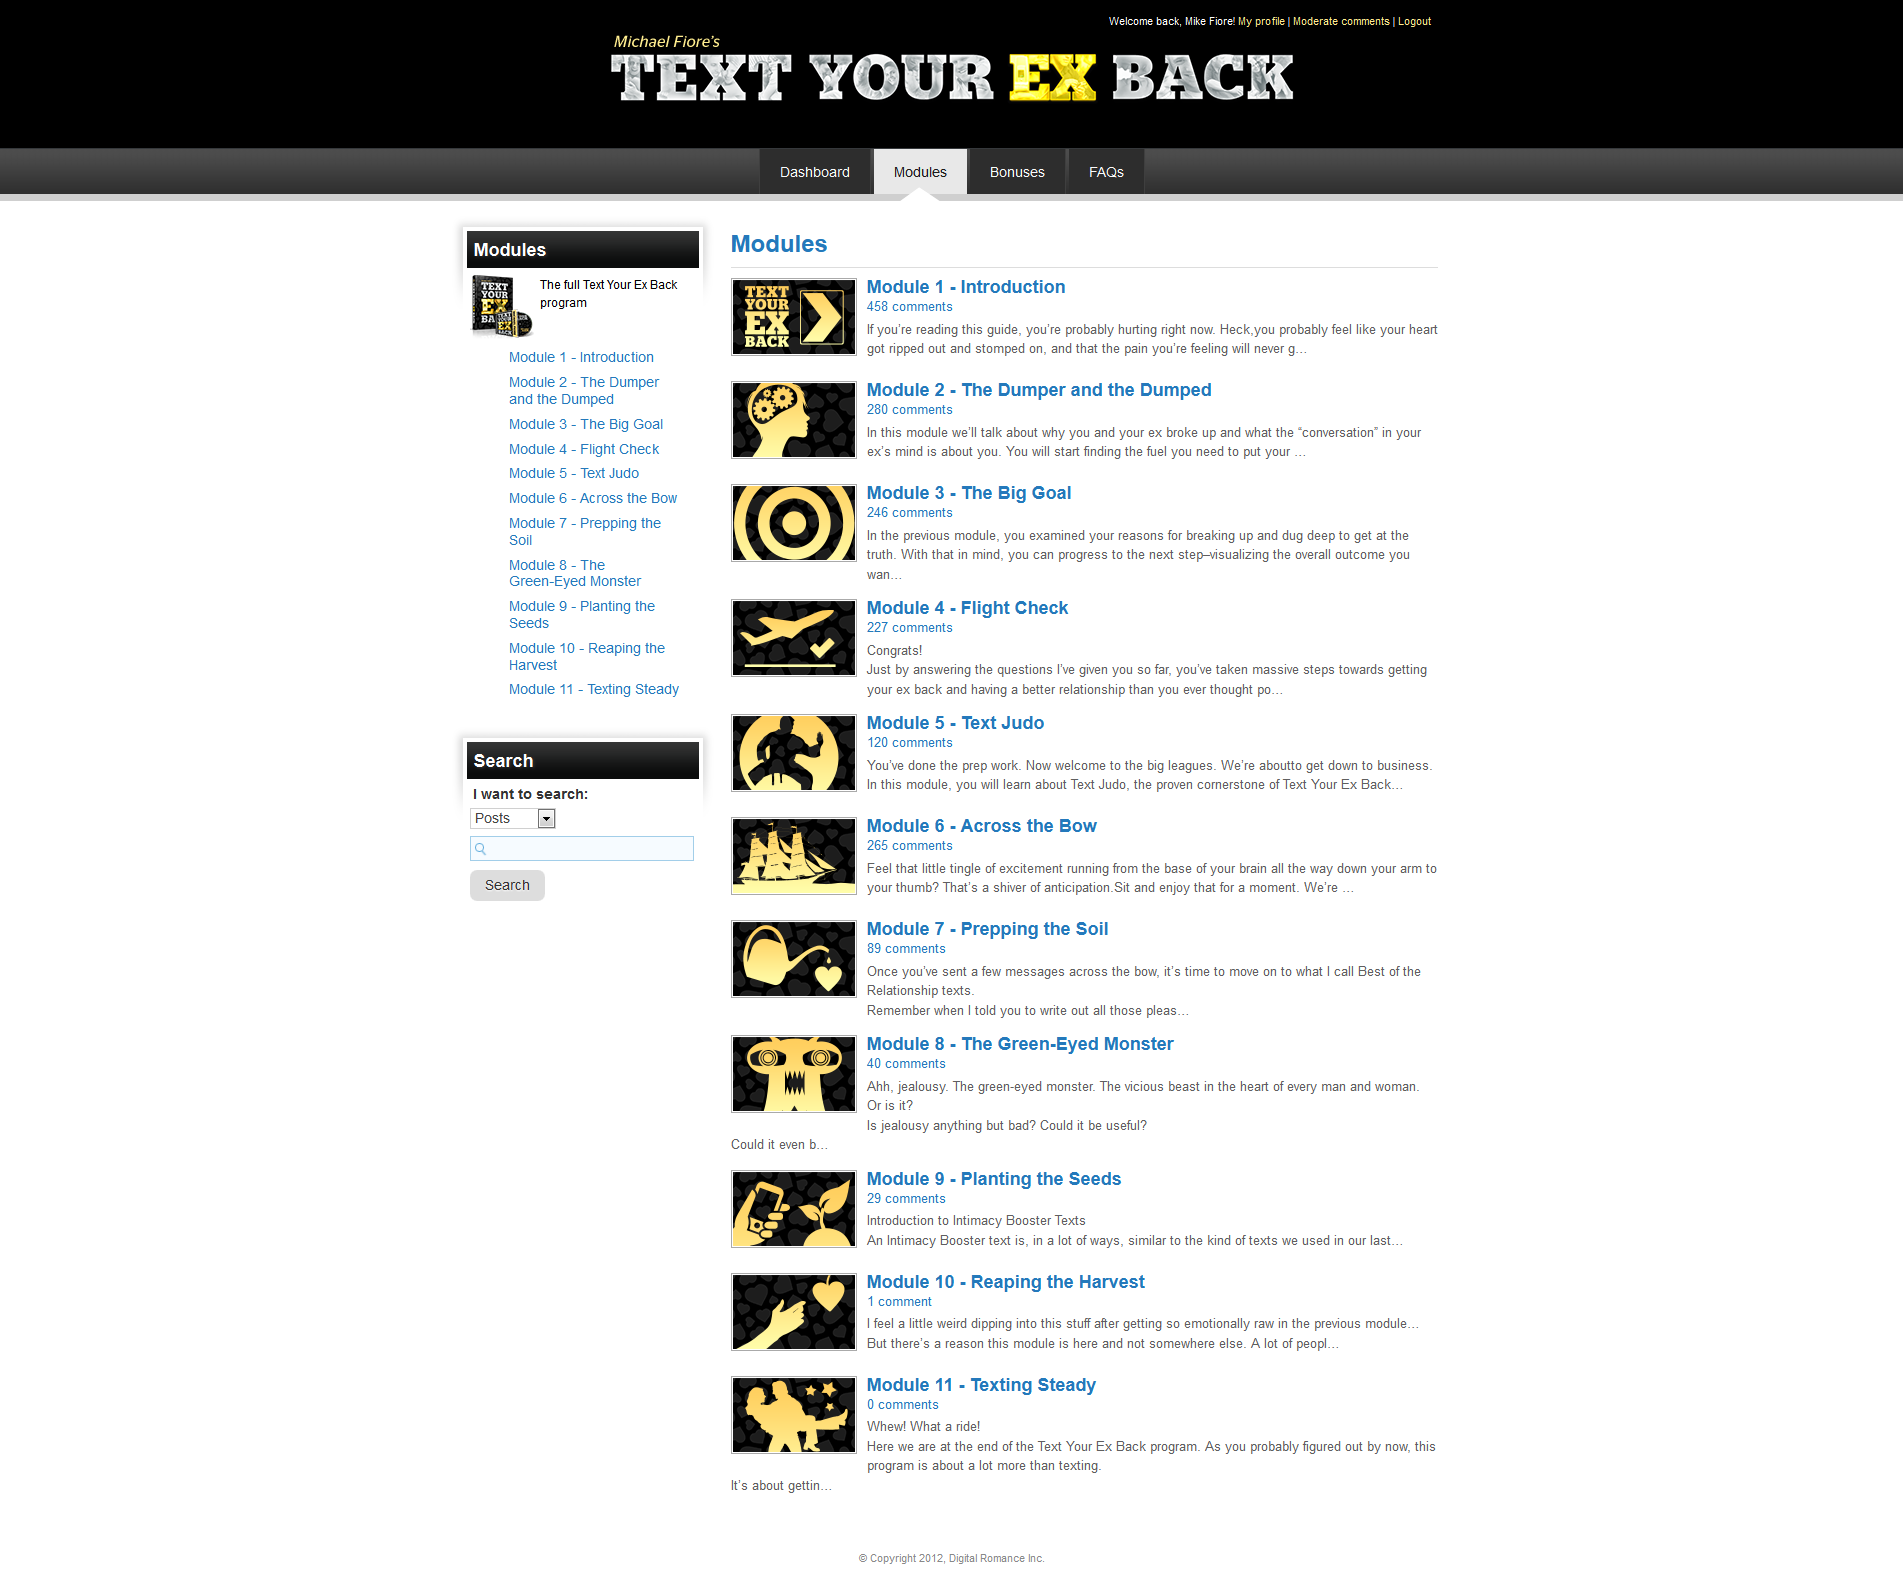 download text your ex back ebook program pdf free